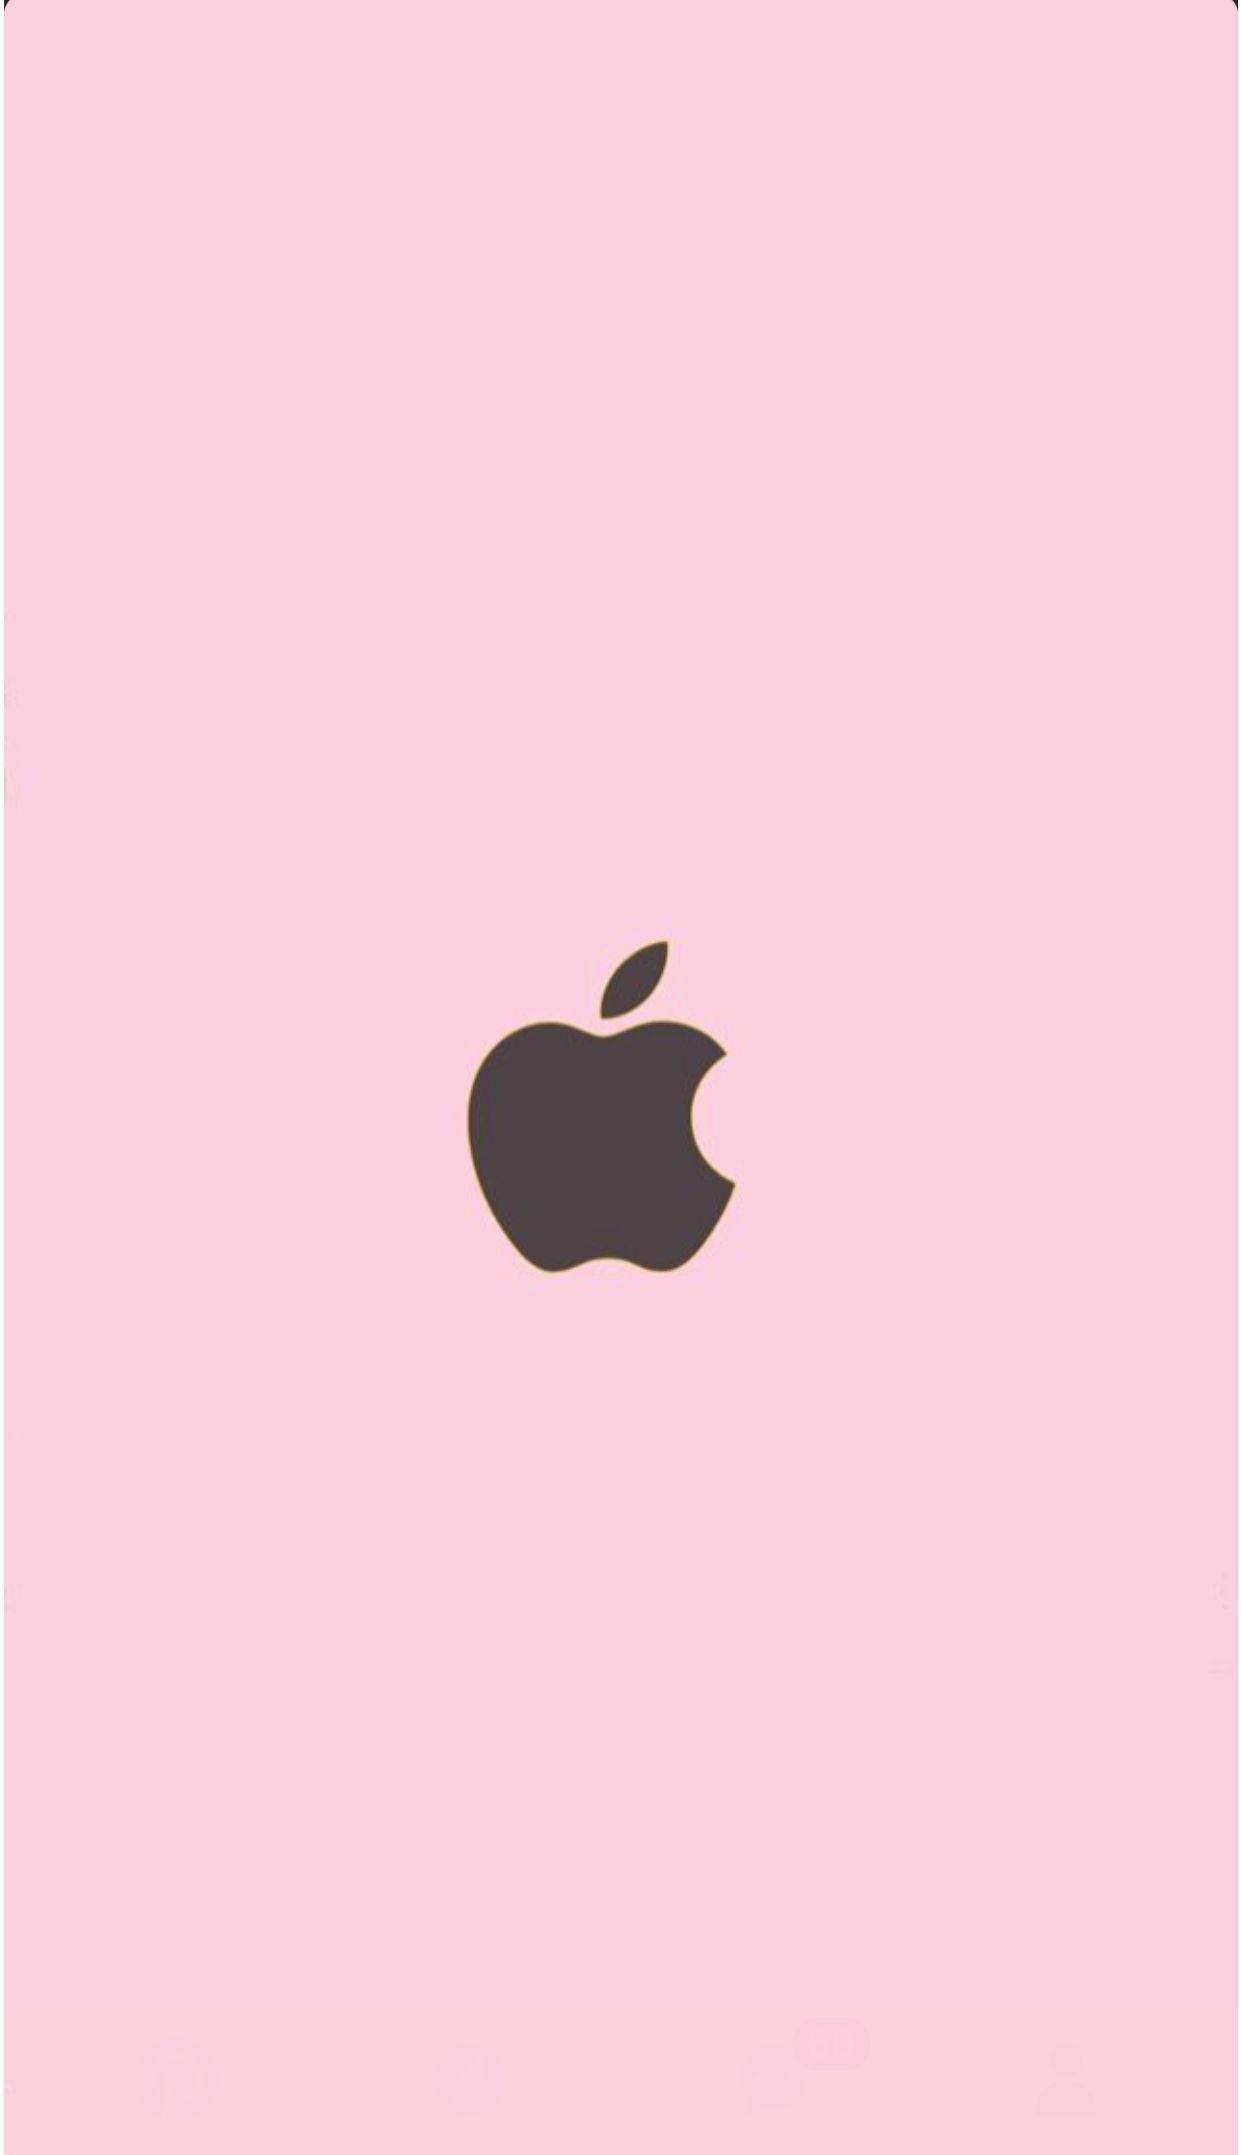 amantes da apple | fondos de pantalla | pinterest | wallpaper, apple